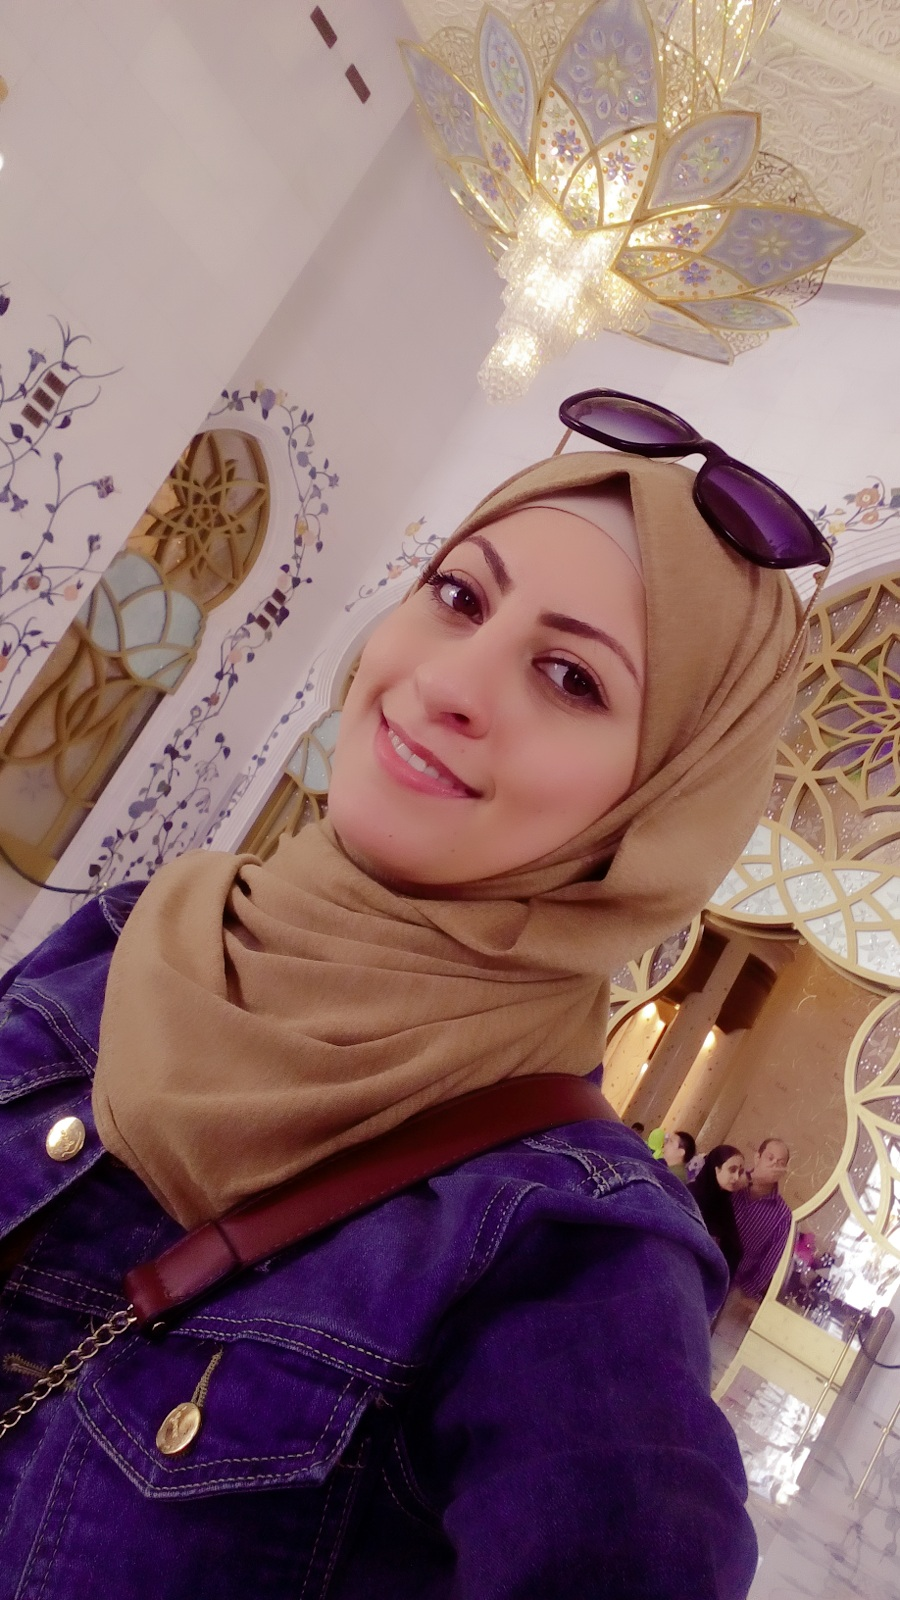 Ms. Layale Hasan